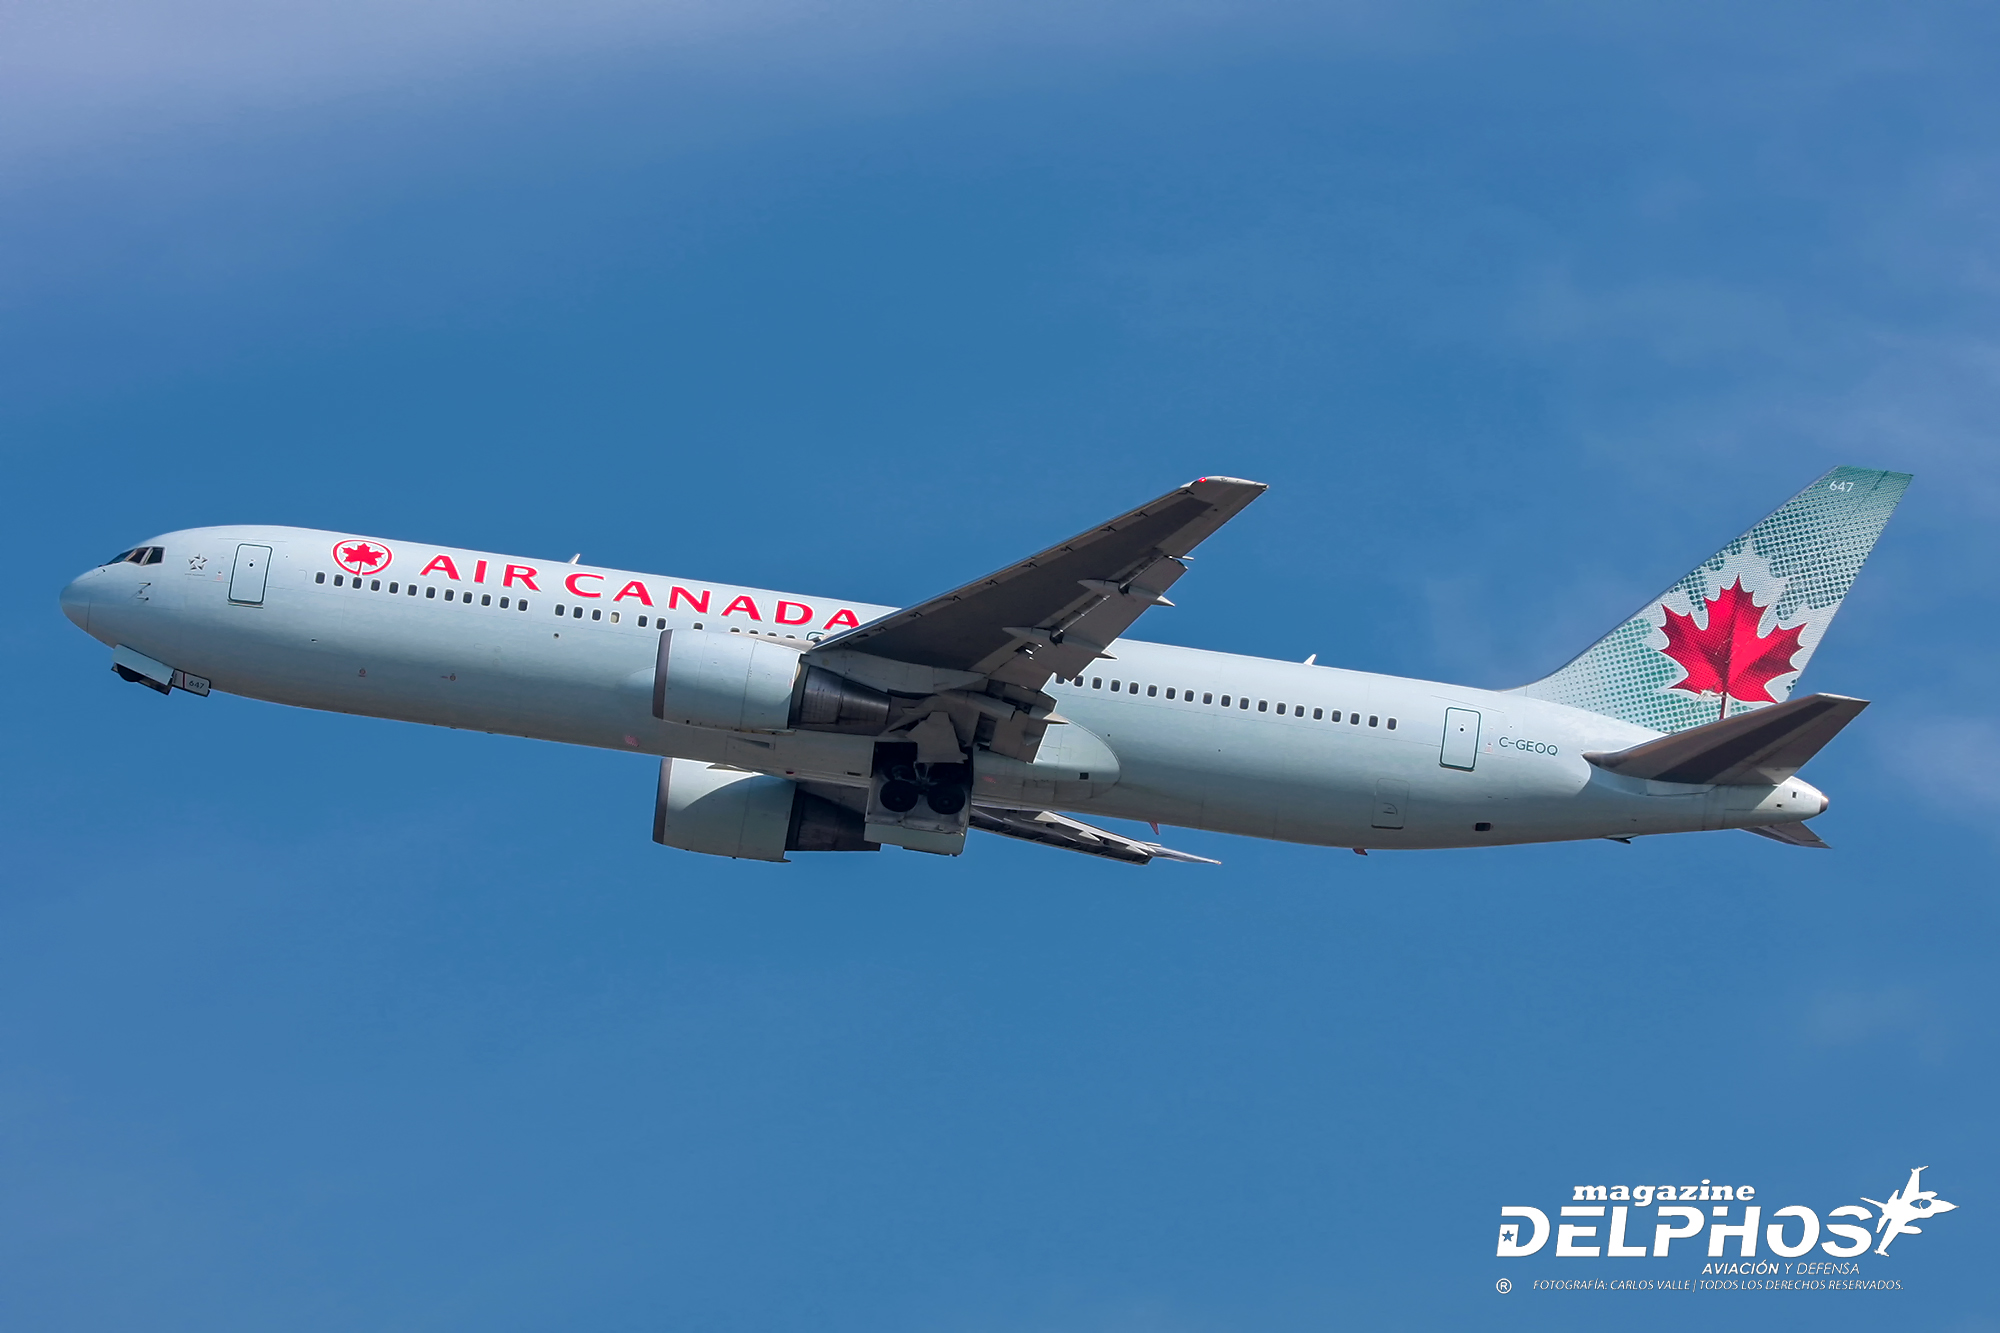 Air Canadá retira en forma anticipada sus Boeing 767-300ER, Airbus A319 y Embraer E-190